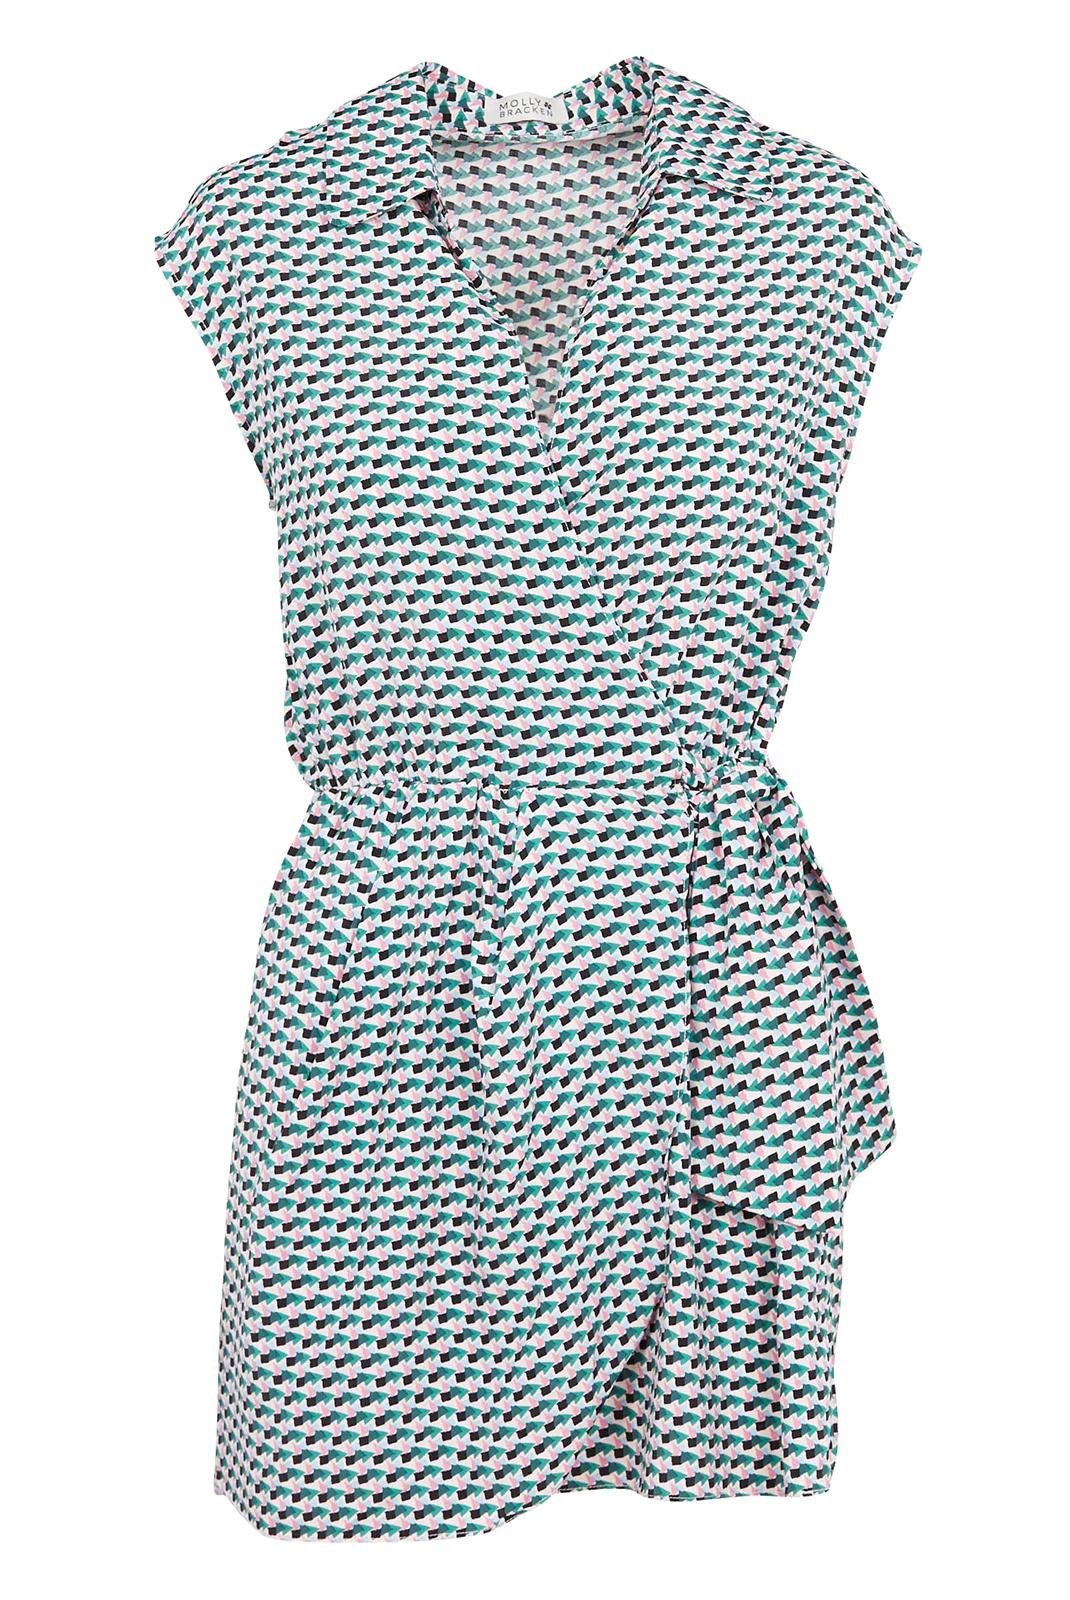 Shorts  Molly bracken LA196AE20 GREEN